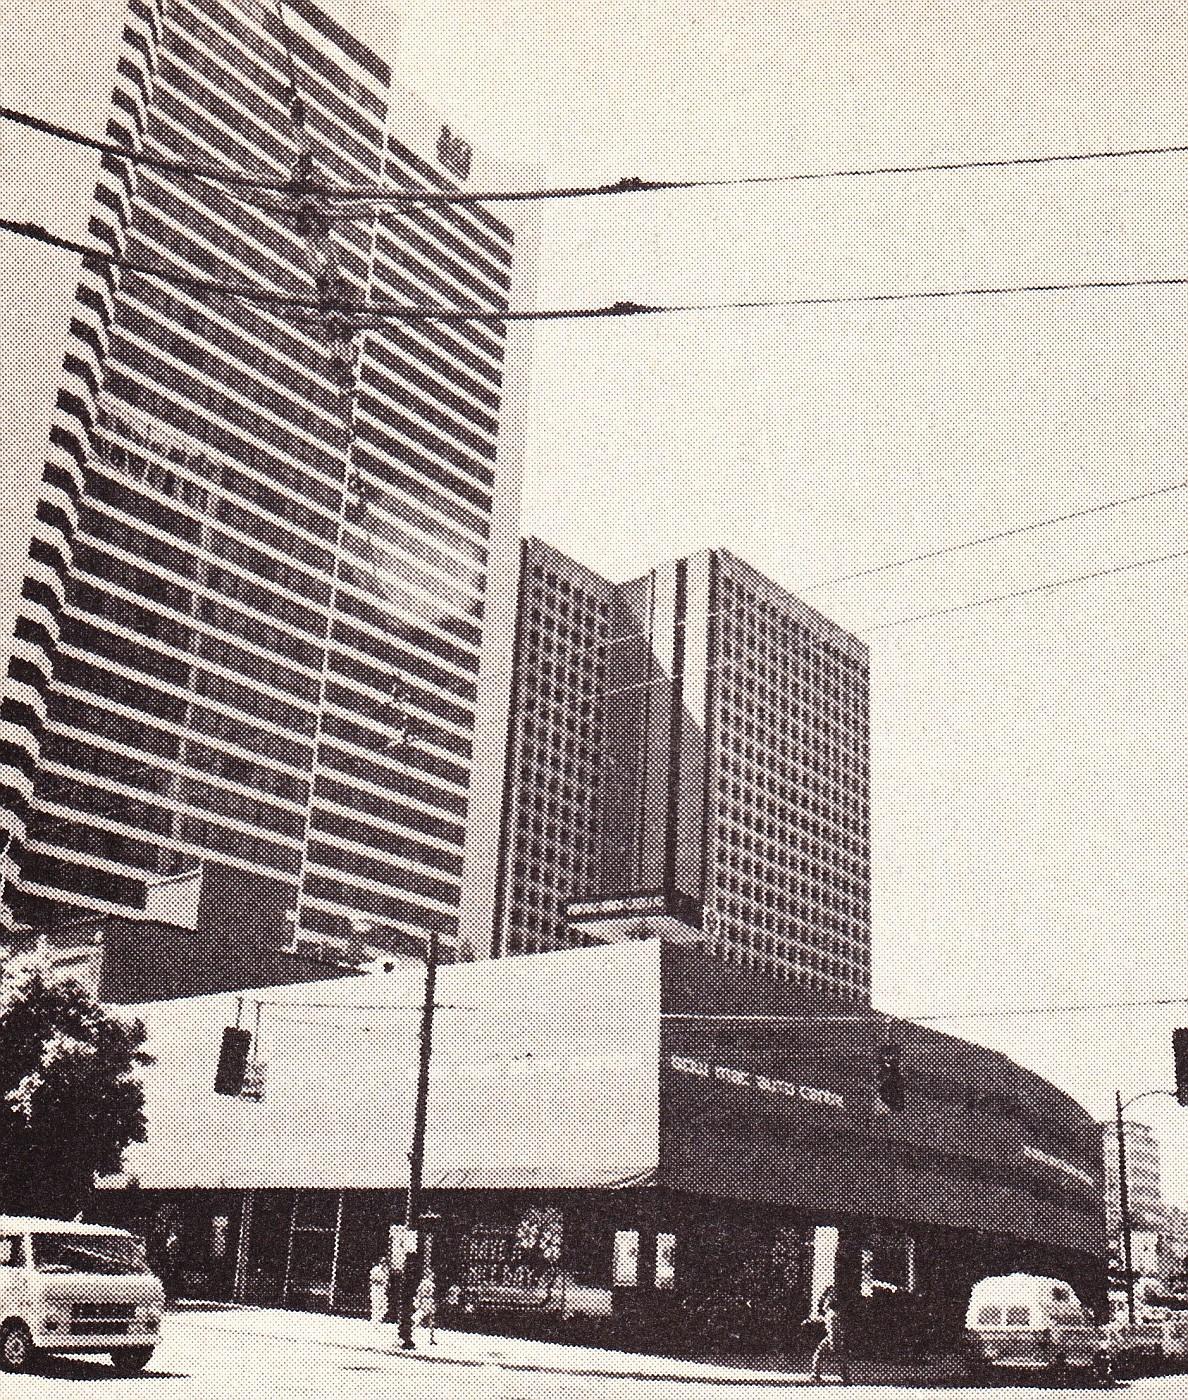 Downtown West Georgia Street Was Once Auto Dealership Row